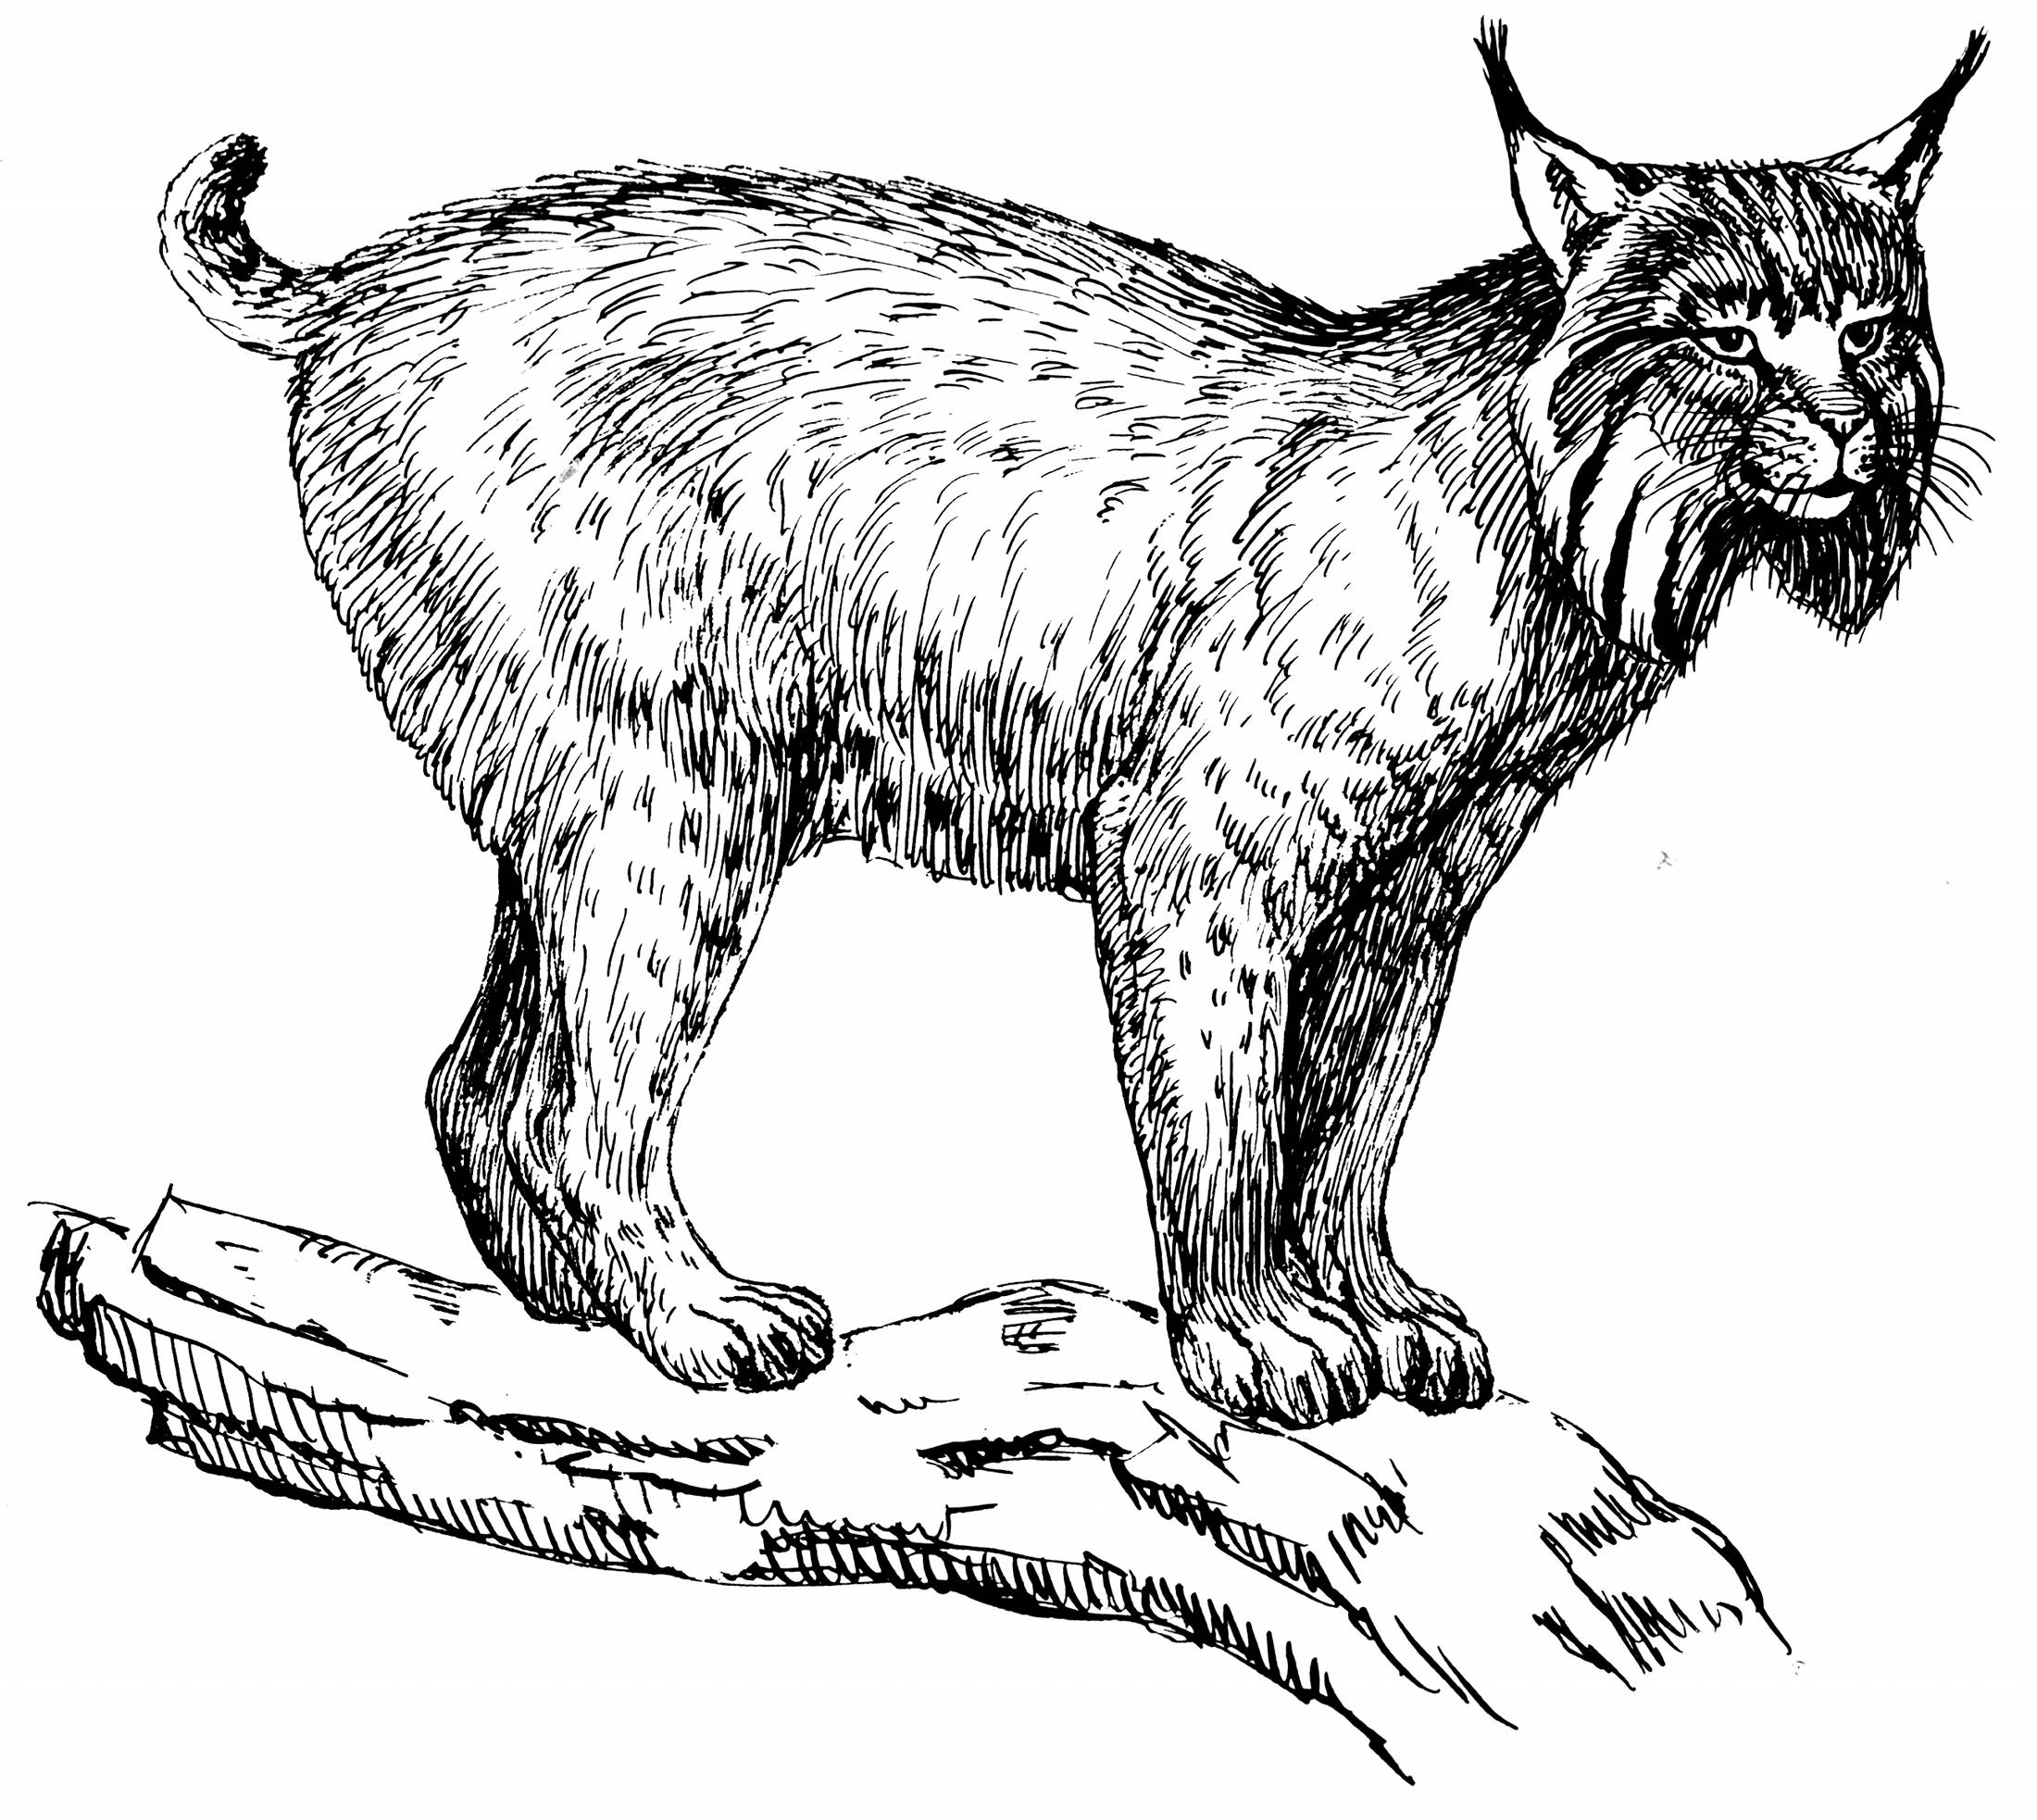 Drawn lynx Pencil Drawing Realistic Images Lynx